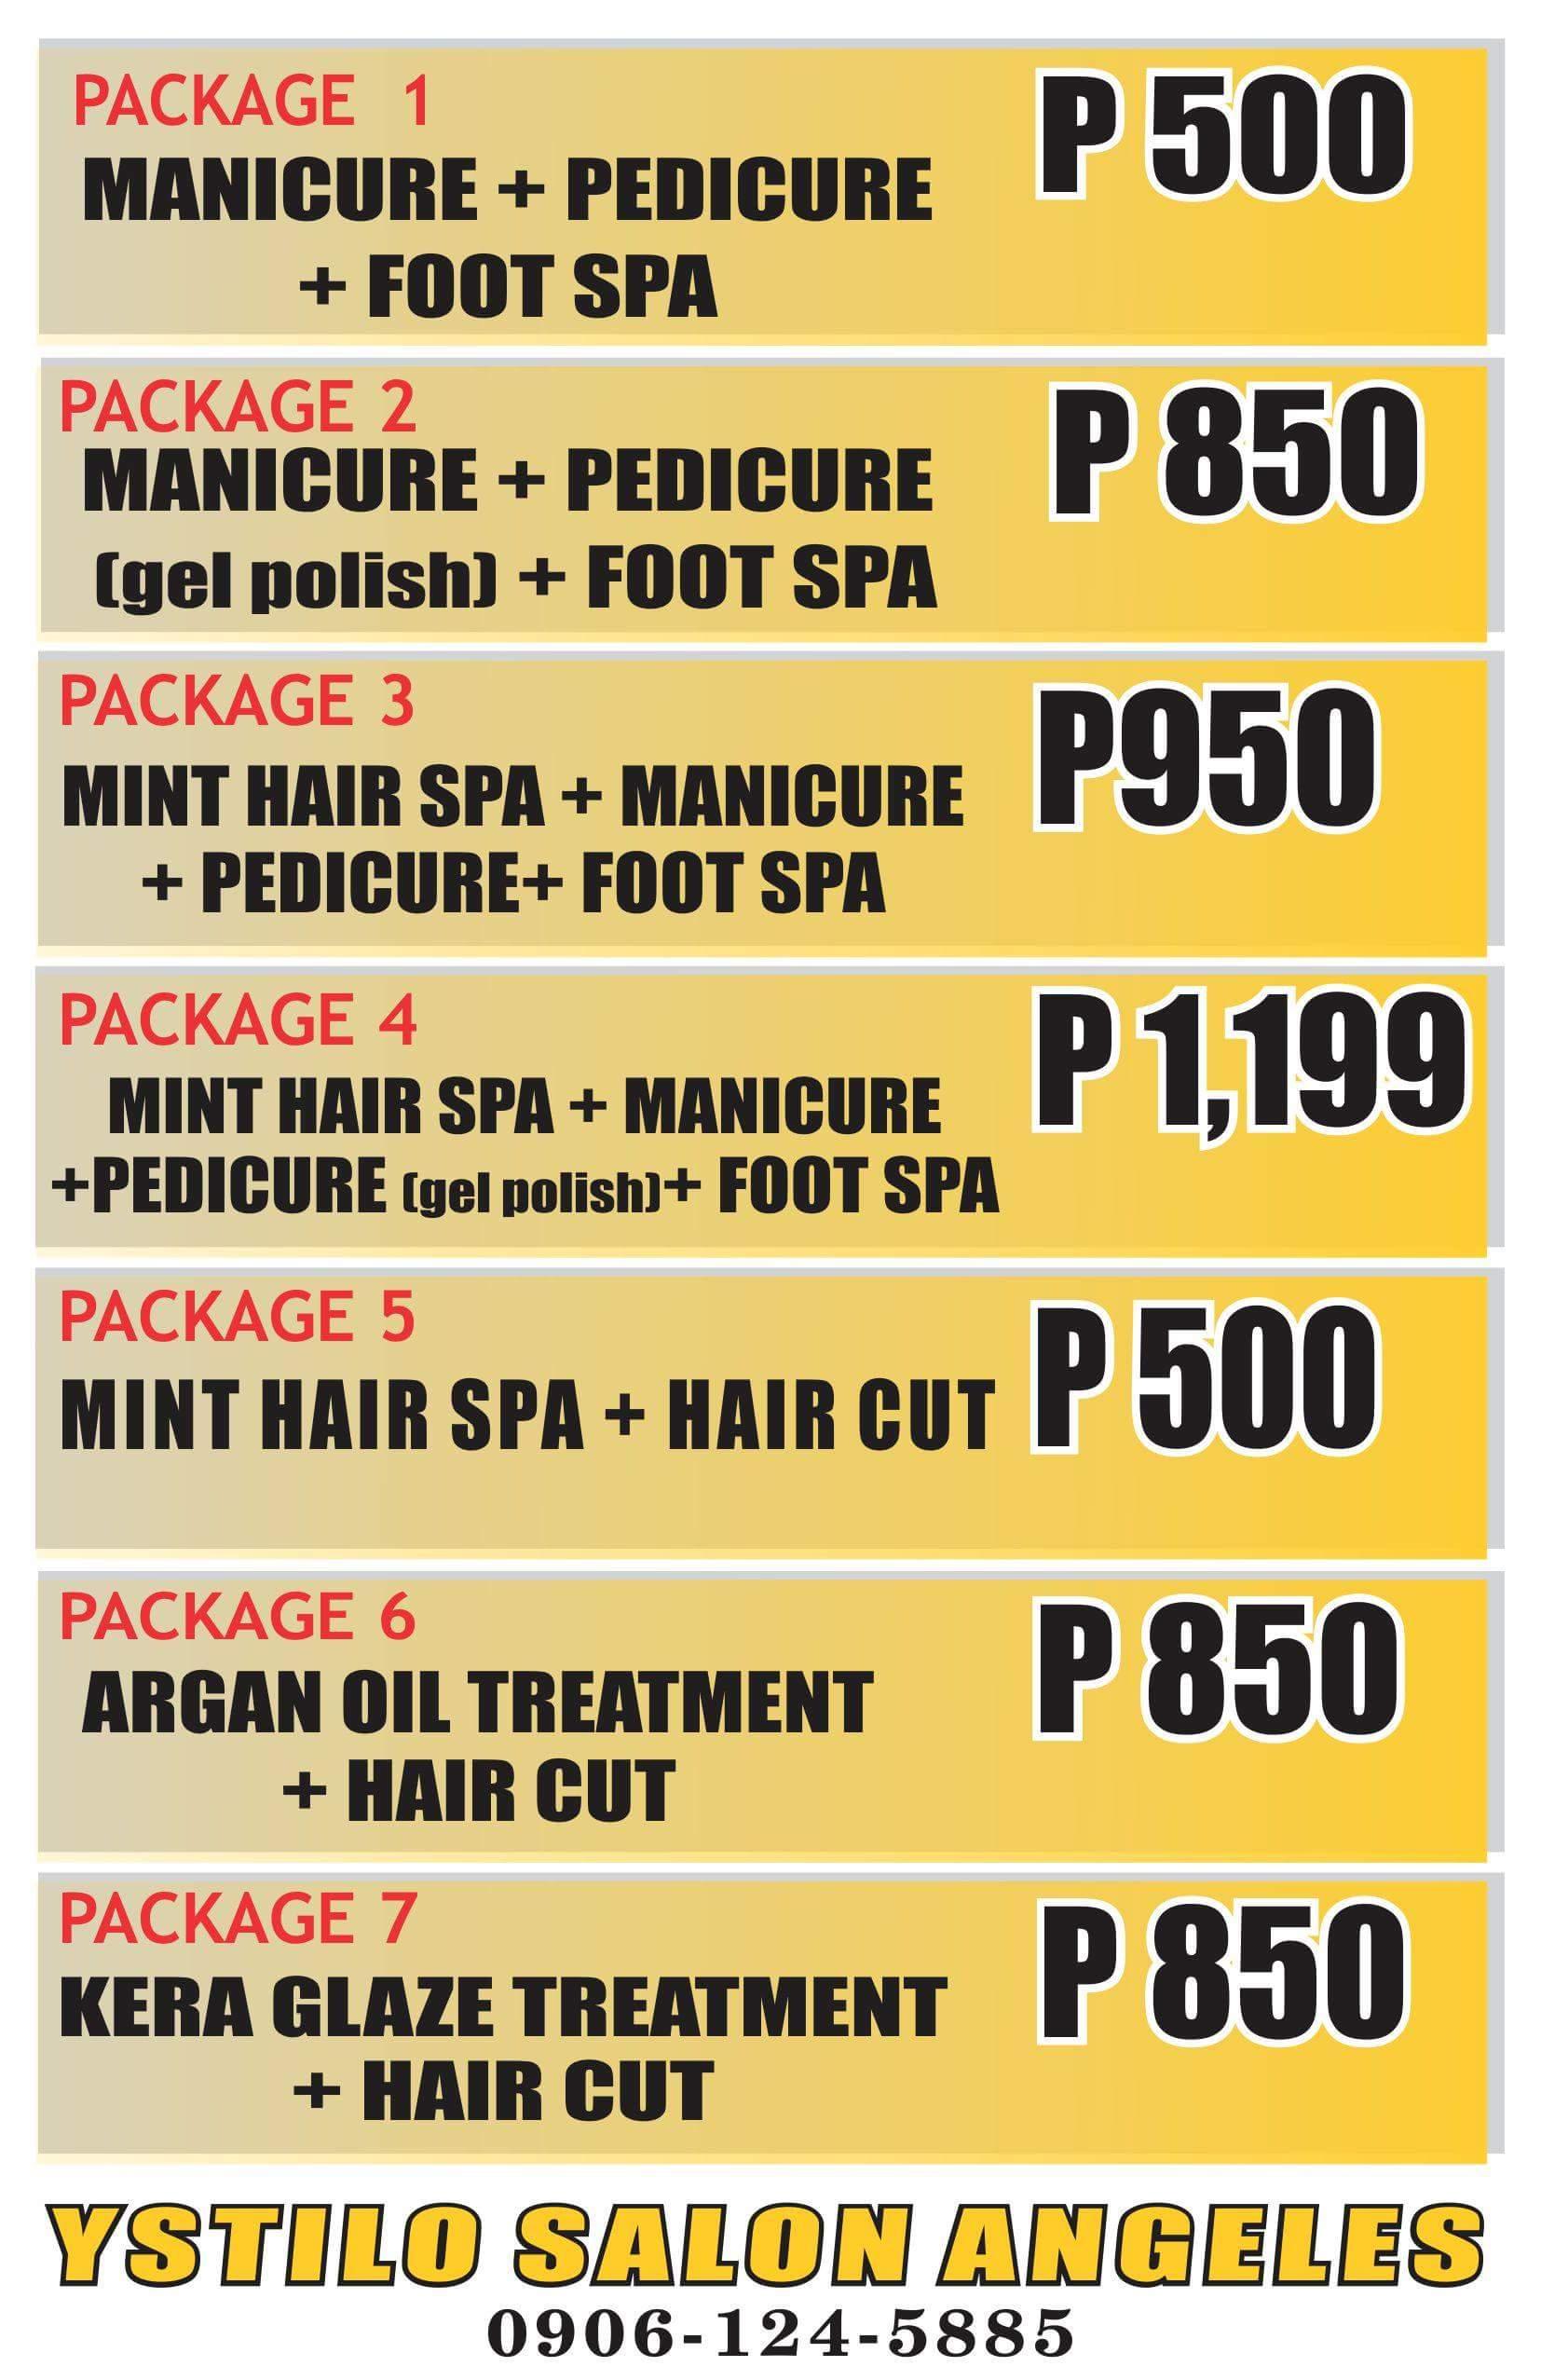 Supercuts Promotion : Recent Deals - Supercuts Free Haircut Printable Coupon